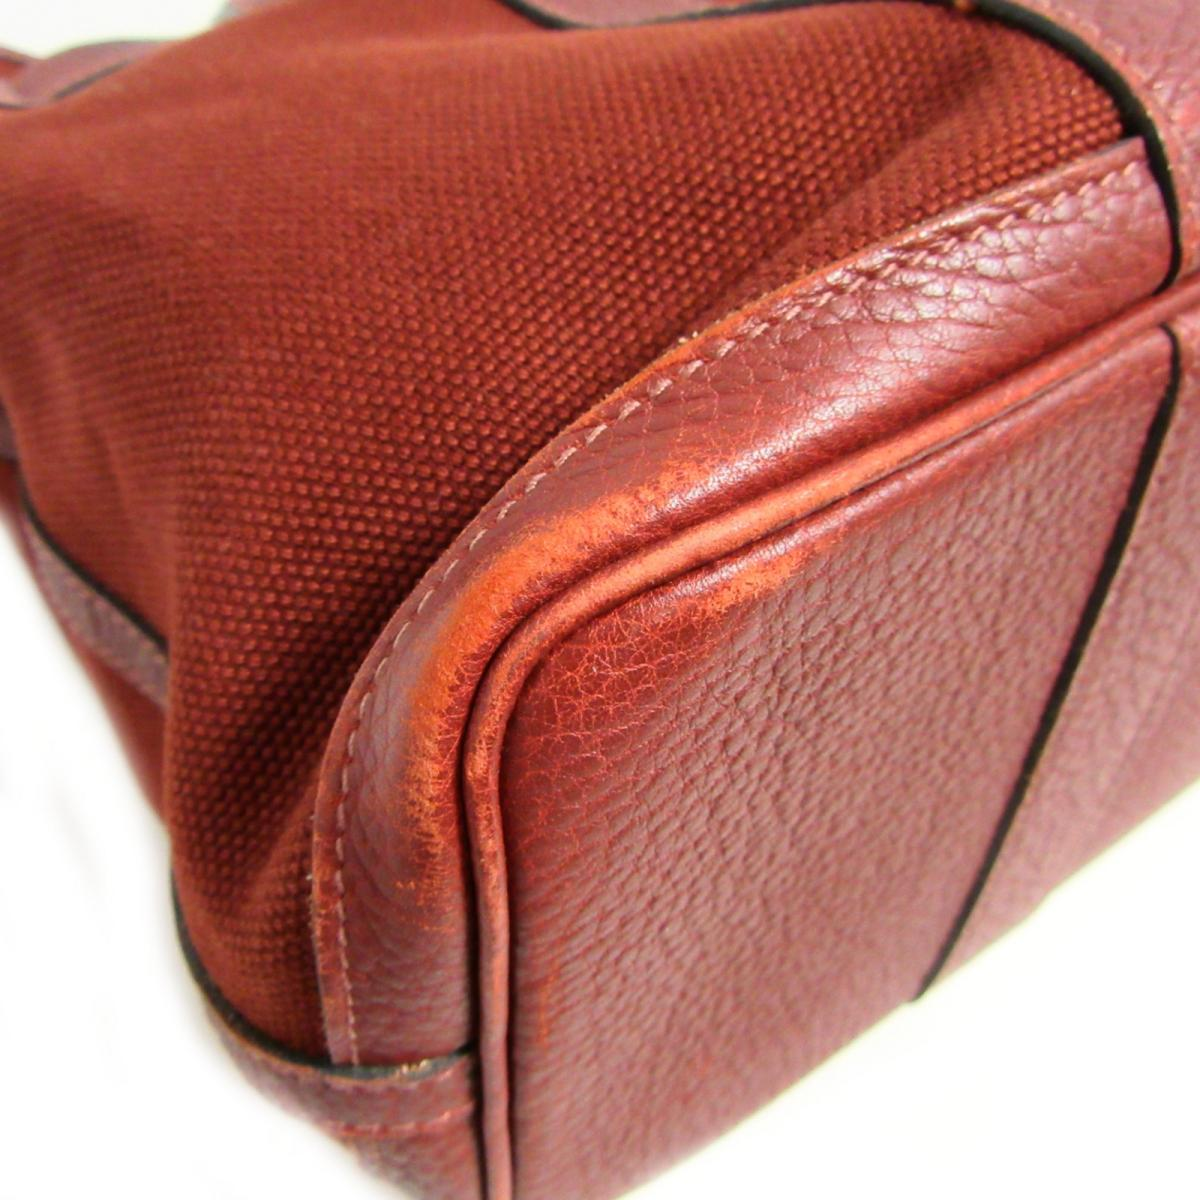 e8b2539a017 (Free shipping) Auth HERMES Sac Petite Ceinture PM hand bag Toile H Negonda  leather Rouge H Vintage